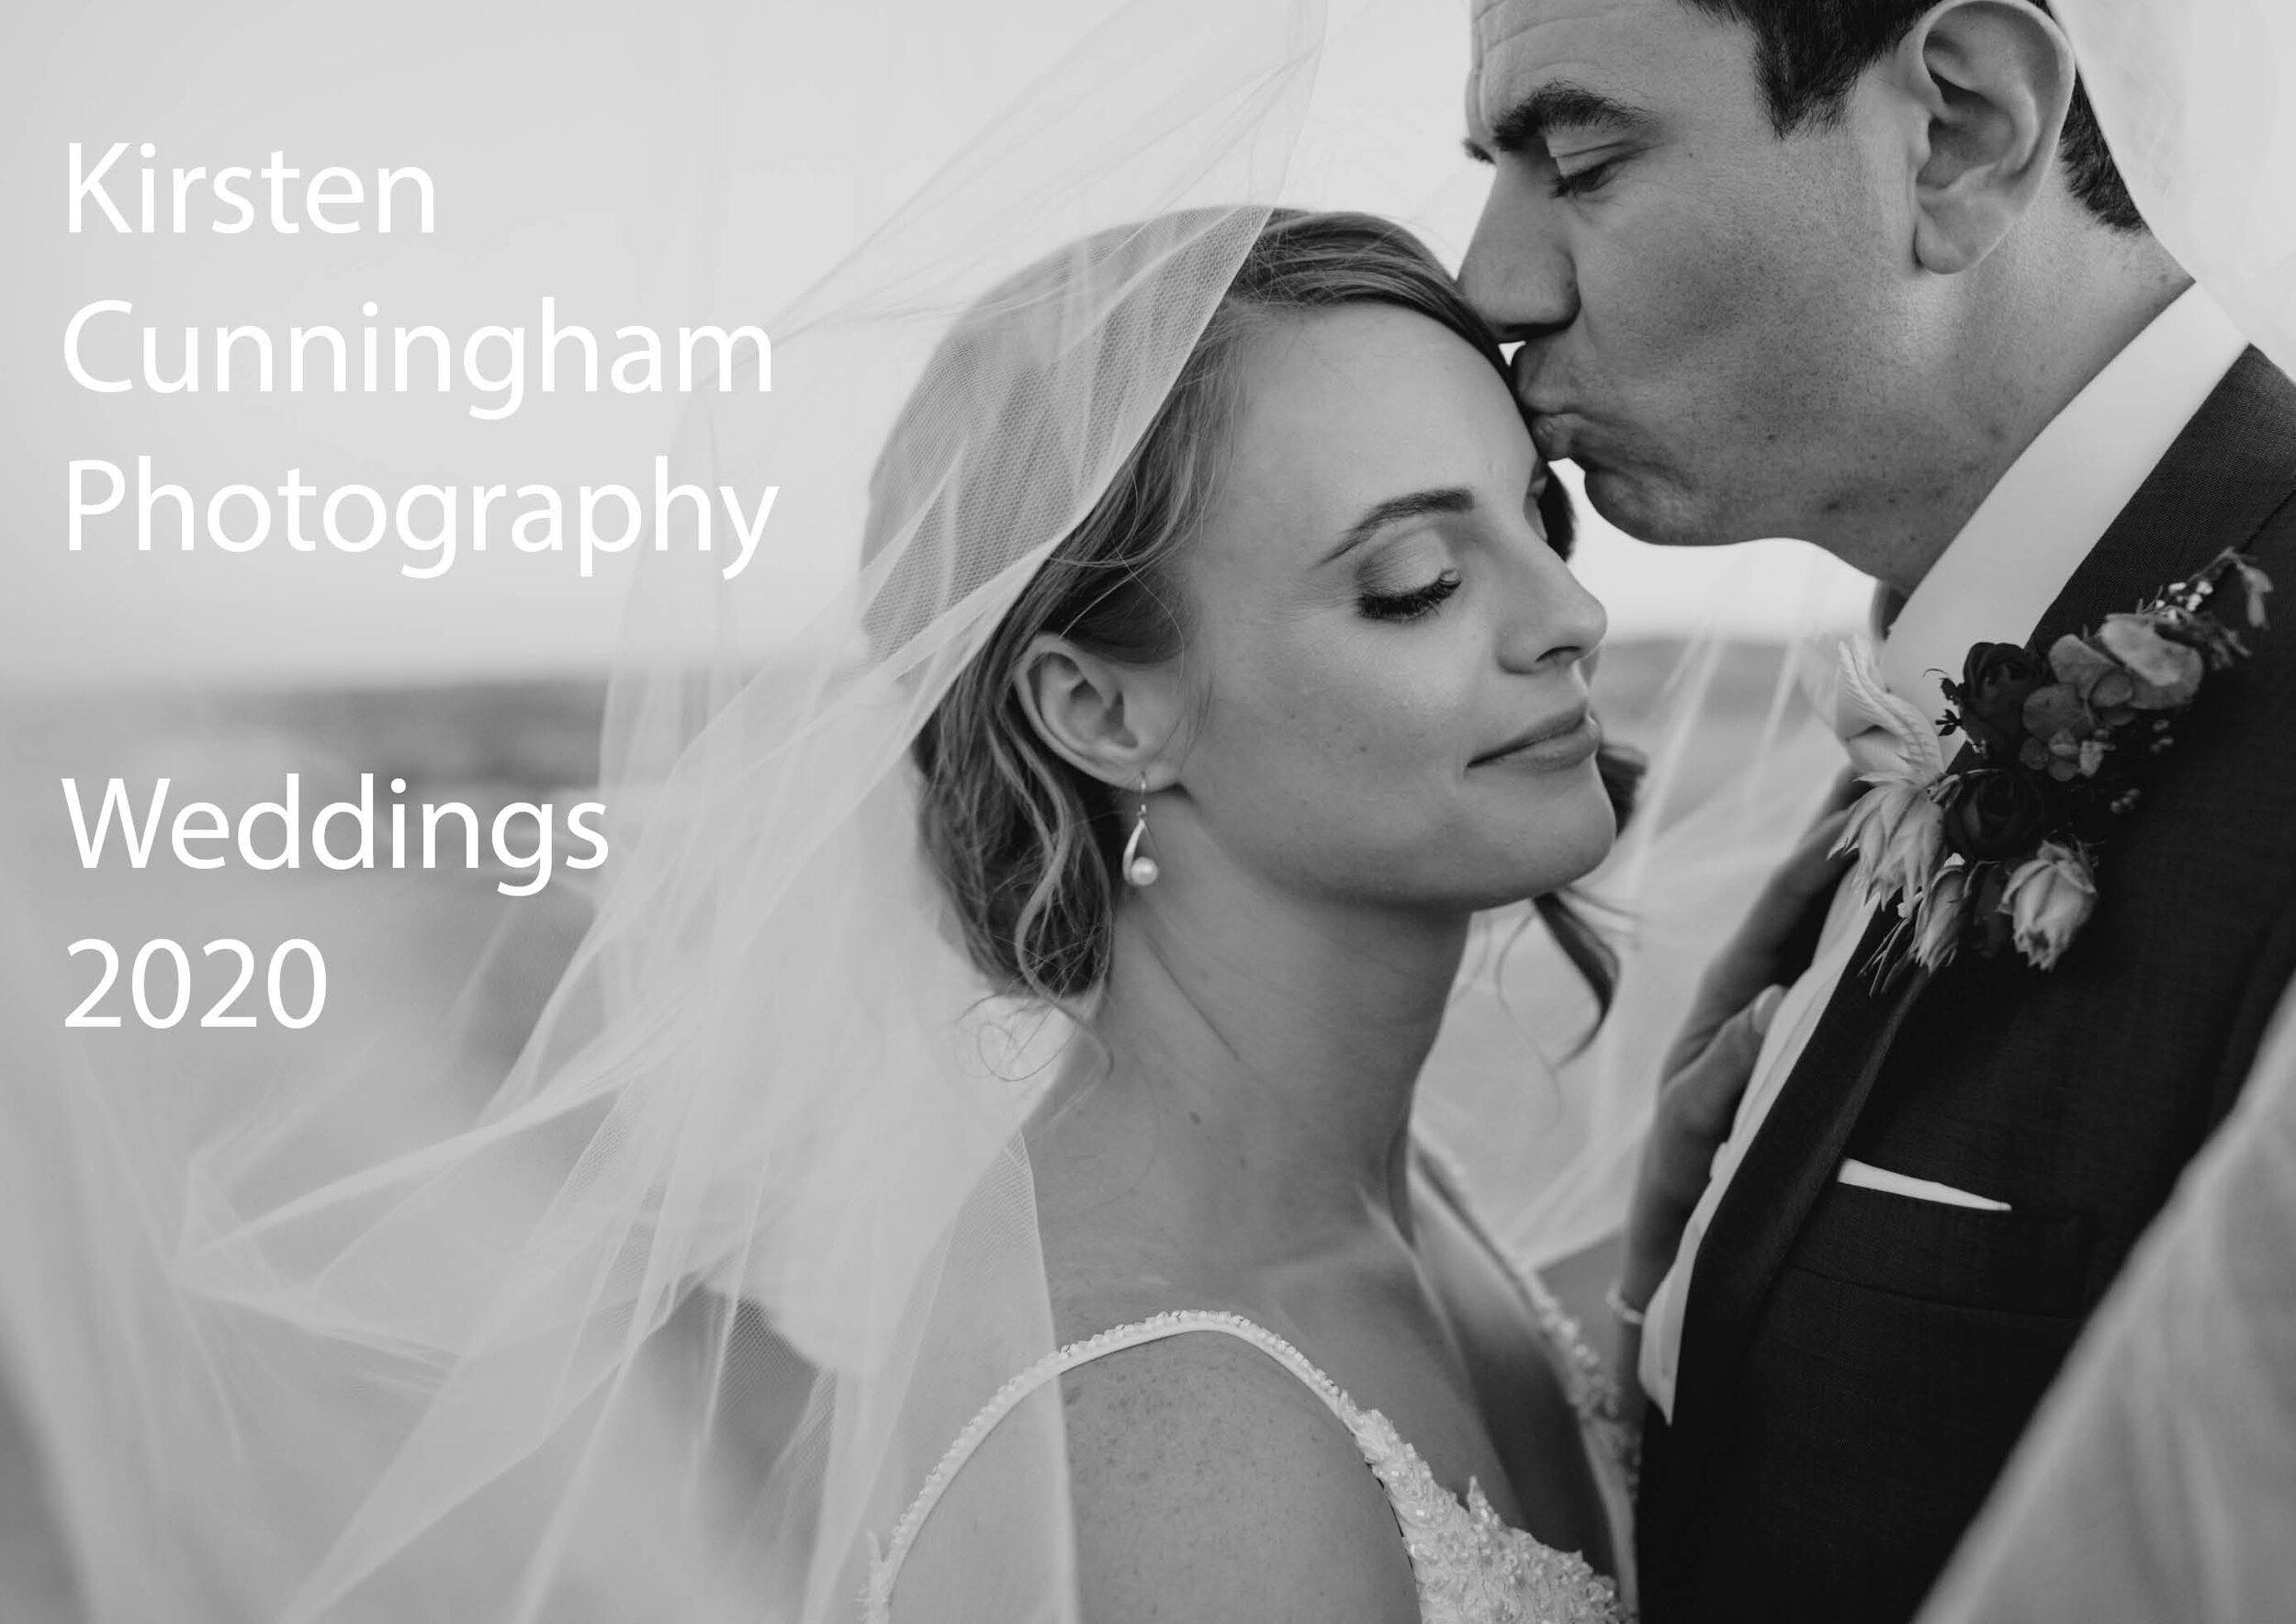 Wedding2020EnquiryPDFOct19.jpg